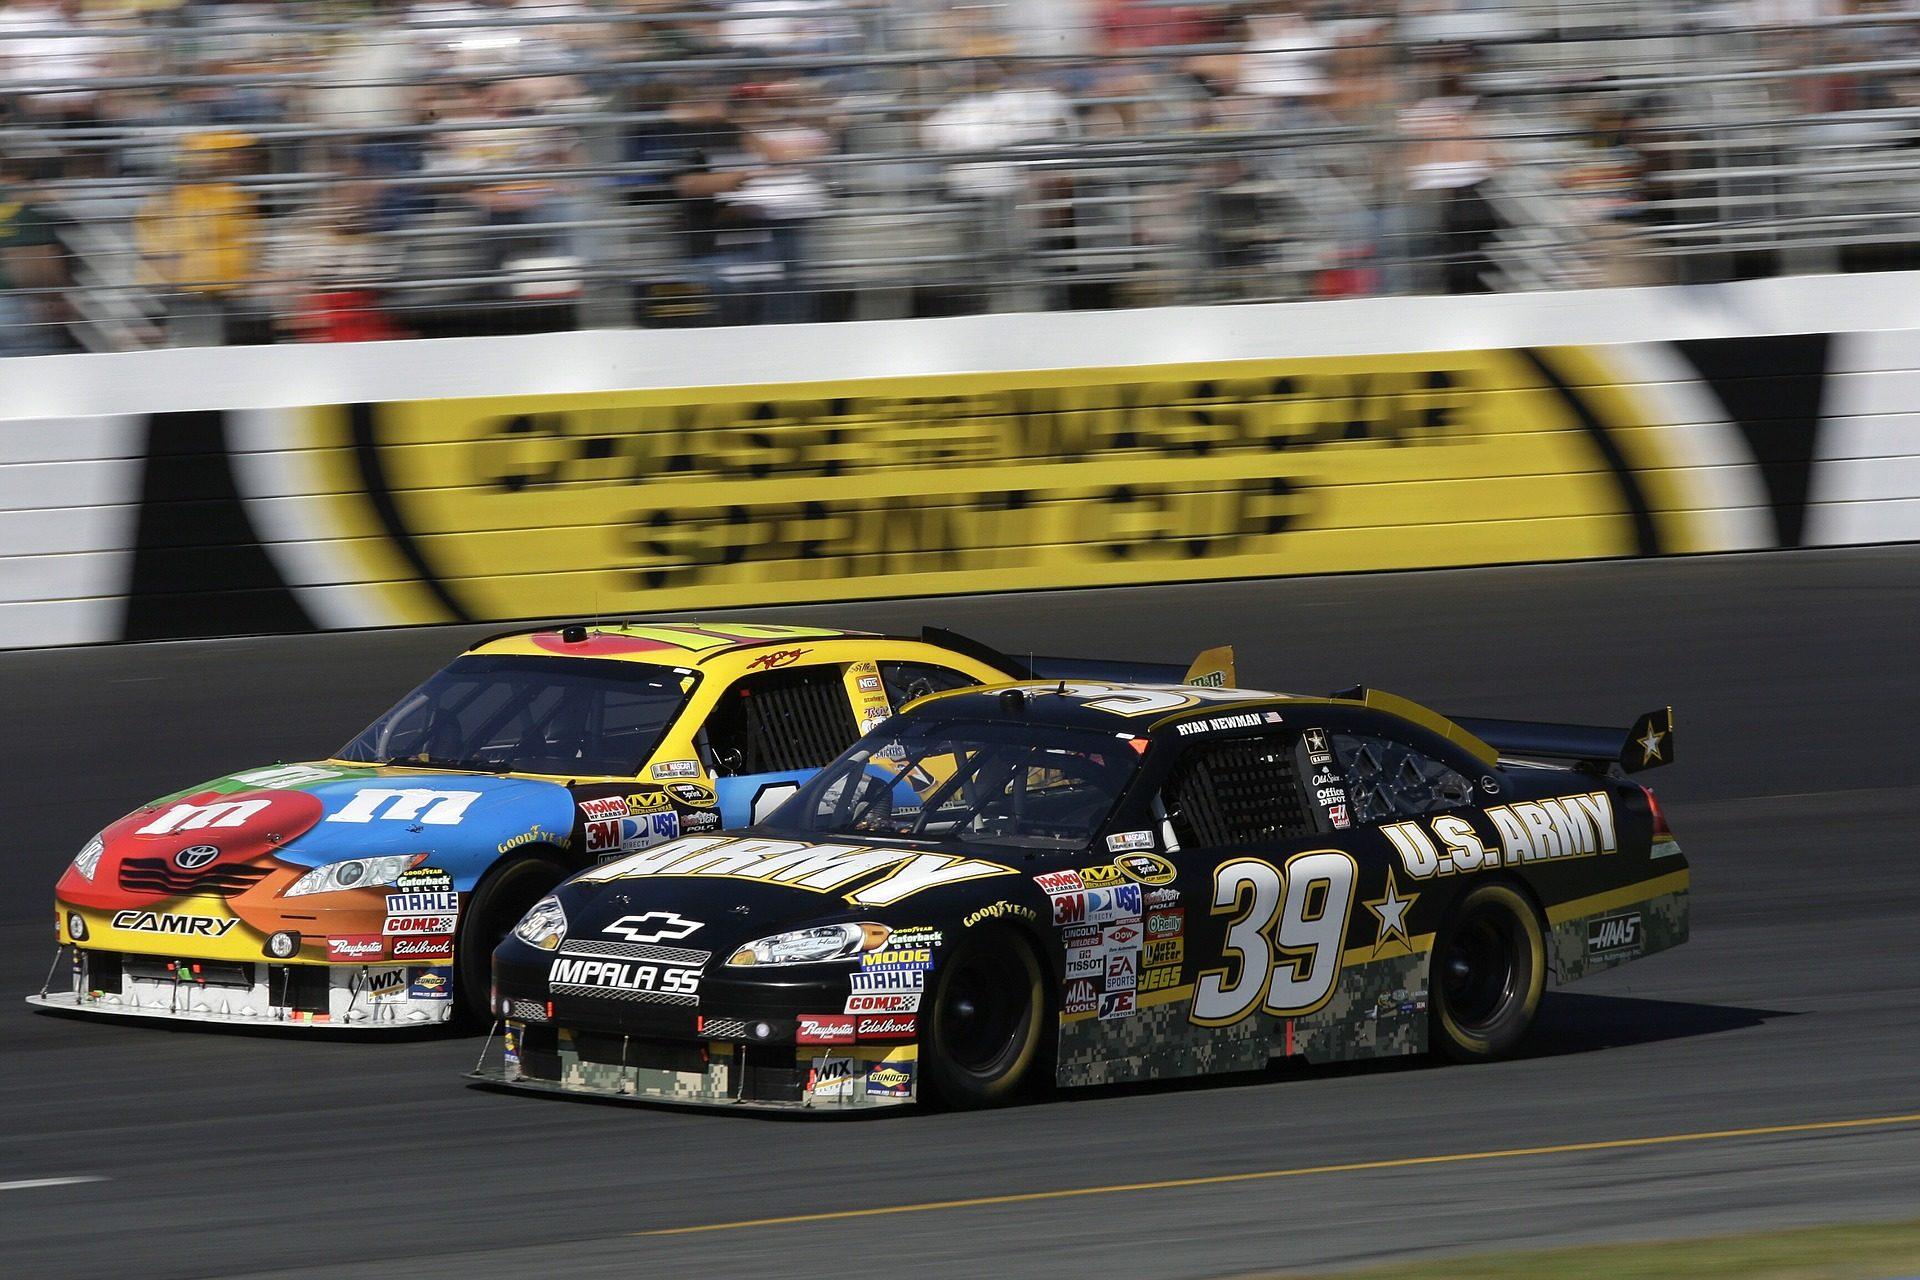 कैरियर, कारें, NASCAR, गति, circuito - HD वॉलपेपर - प्रोफेसर-falken.com